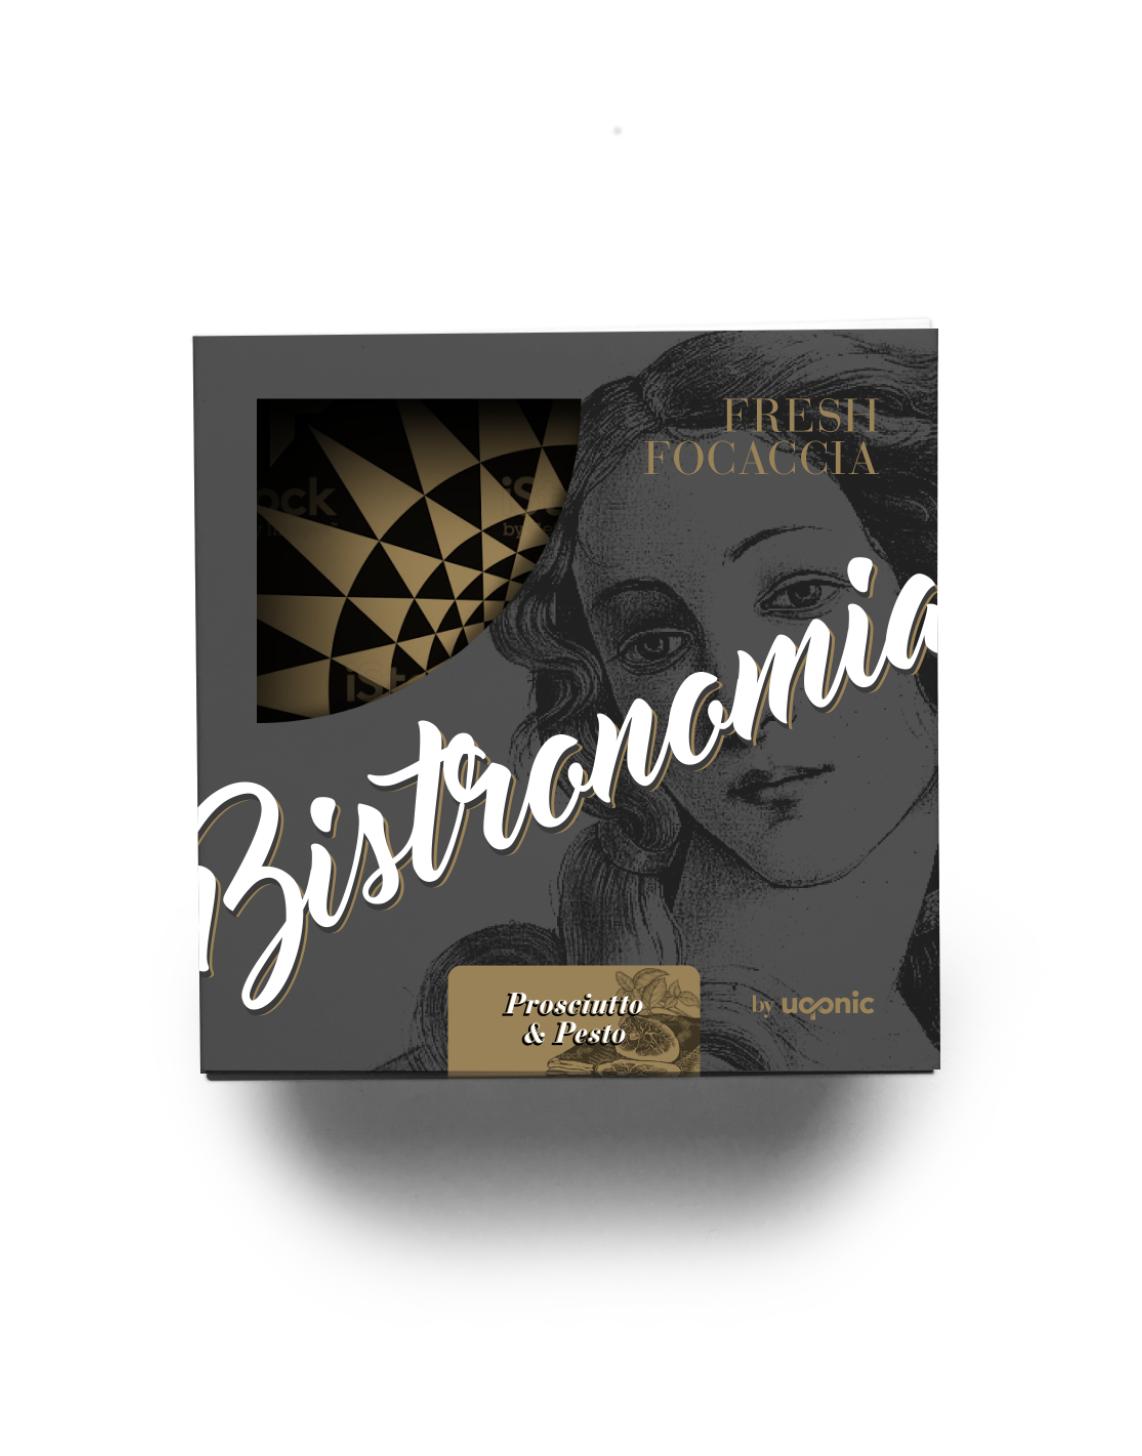 Bistronomia_Thumb